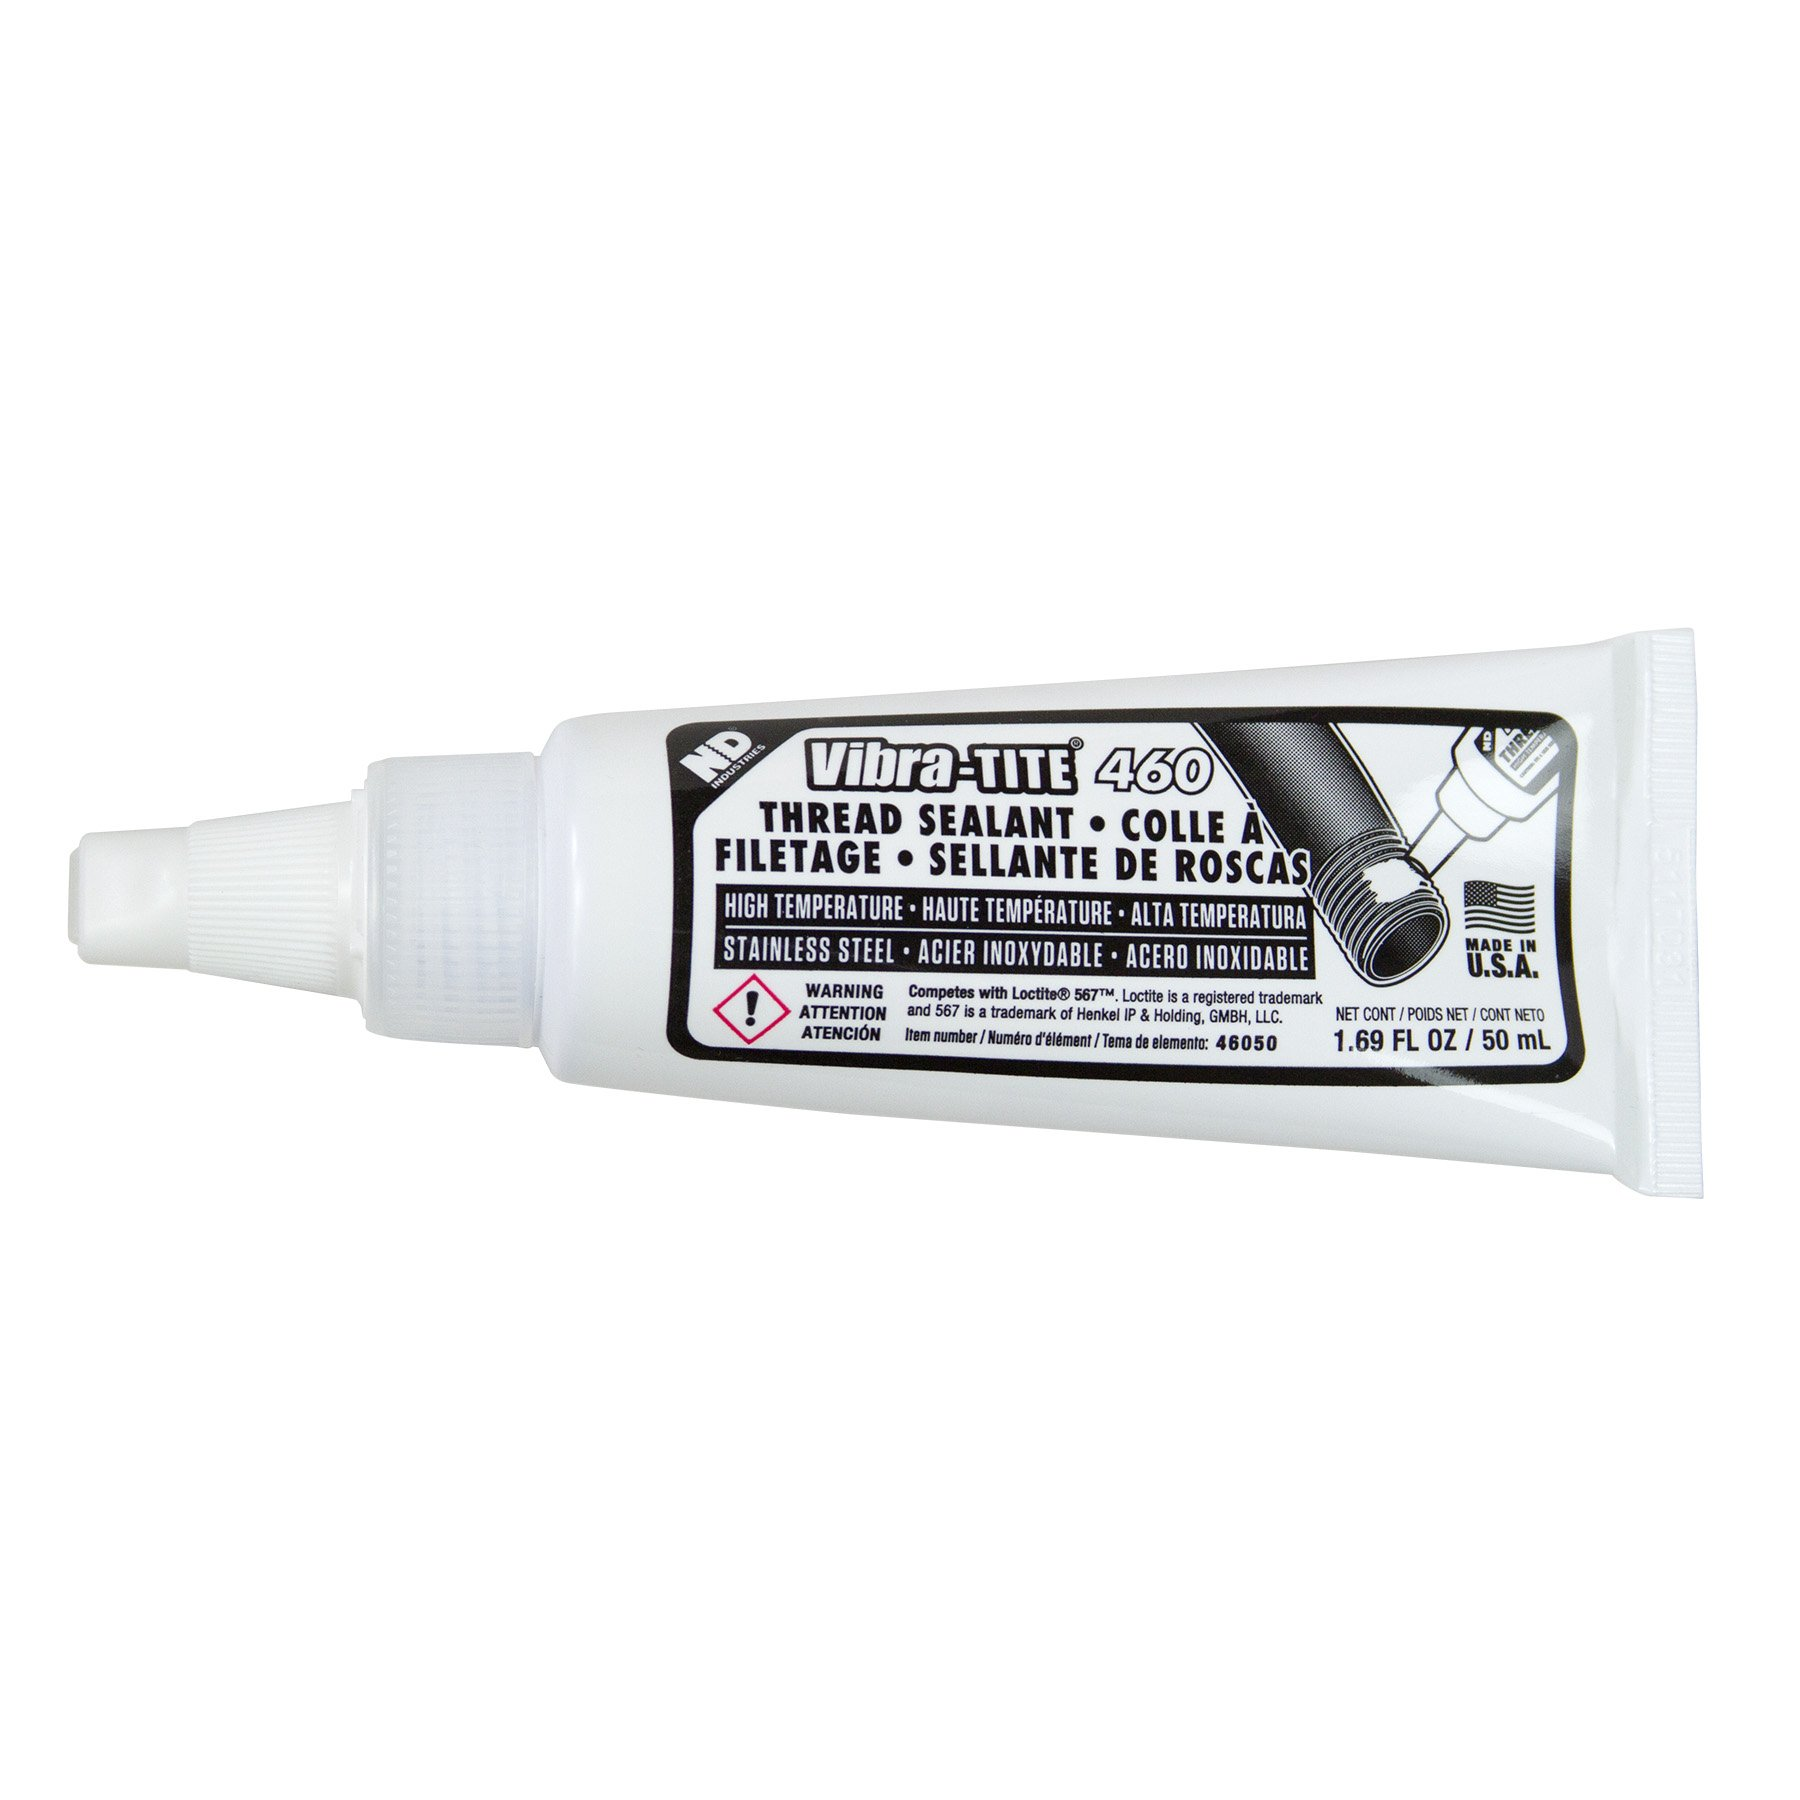 Vibra-TITE 460 General Purpose Stainless Steel Anaerobic Thread Pipe Sealant, 50 ml Tube, White by Vibra-TITE